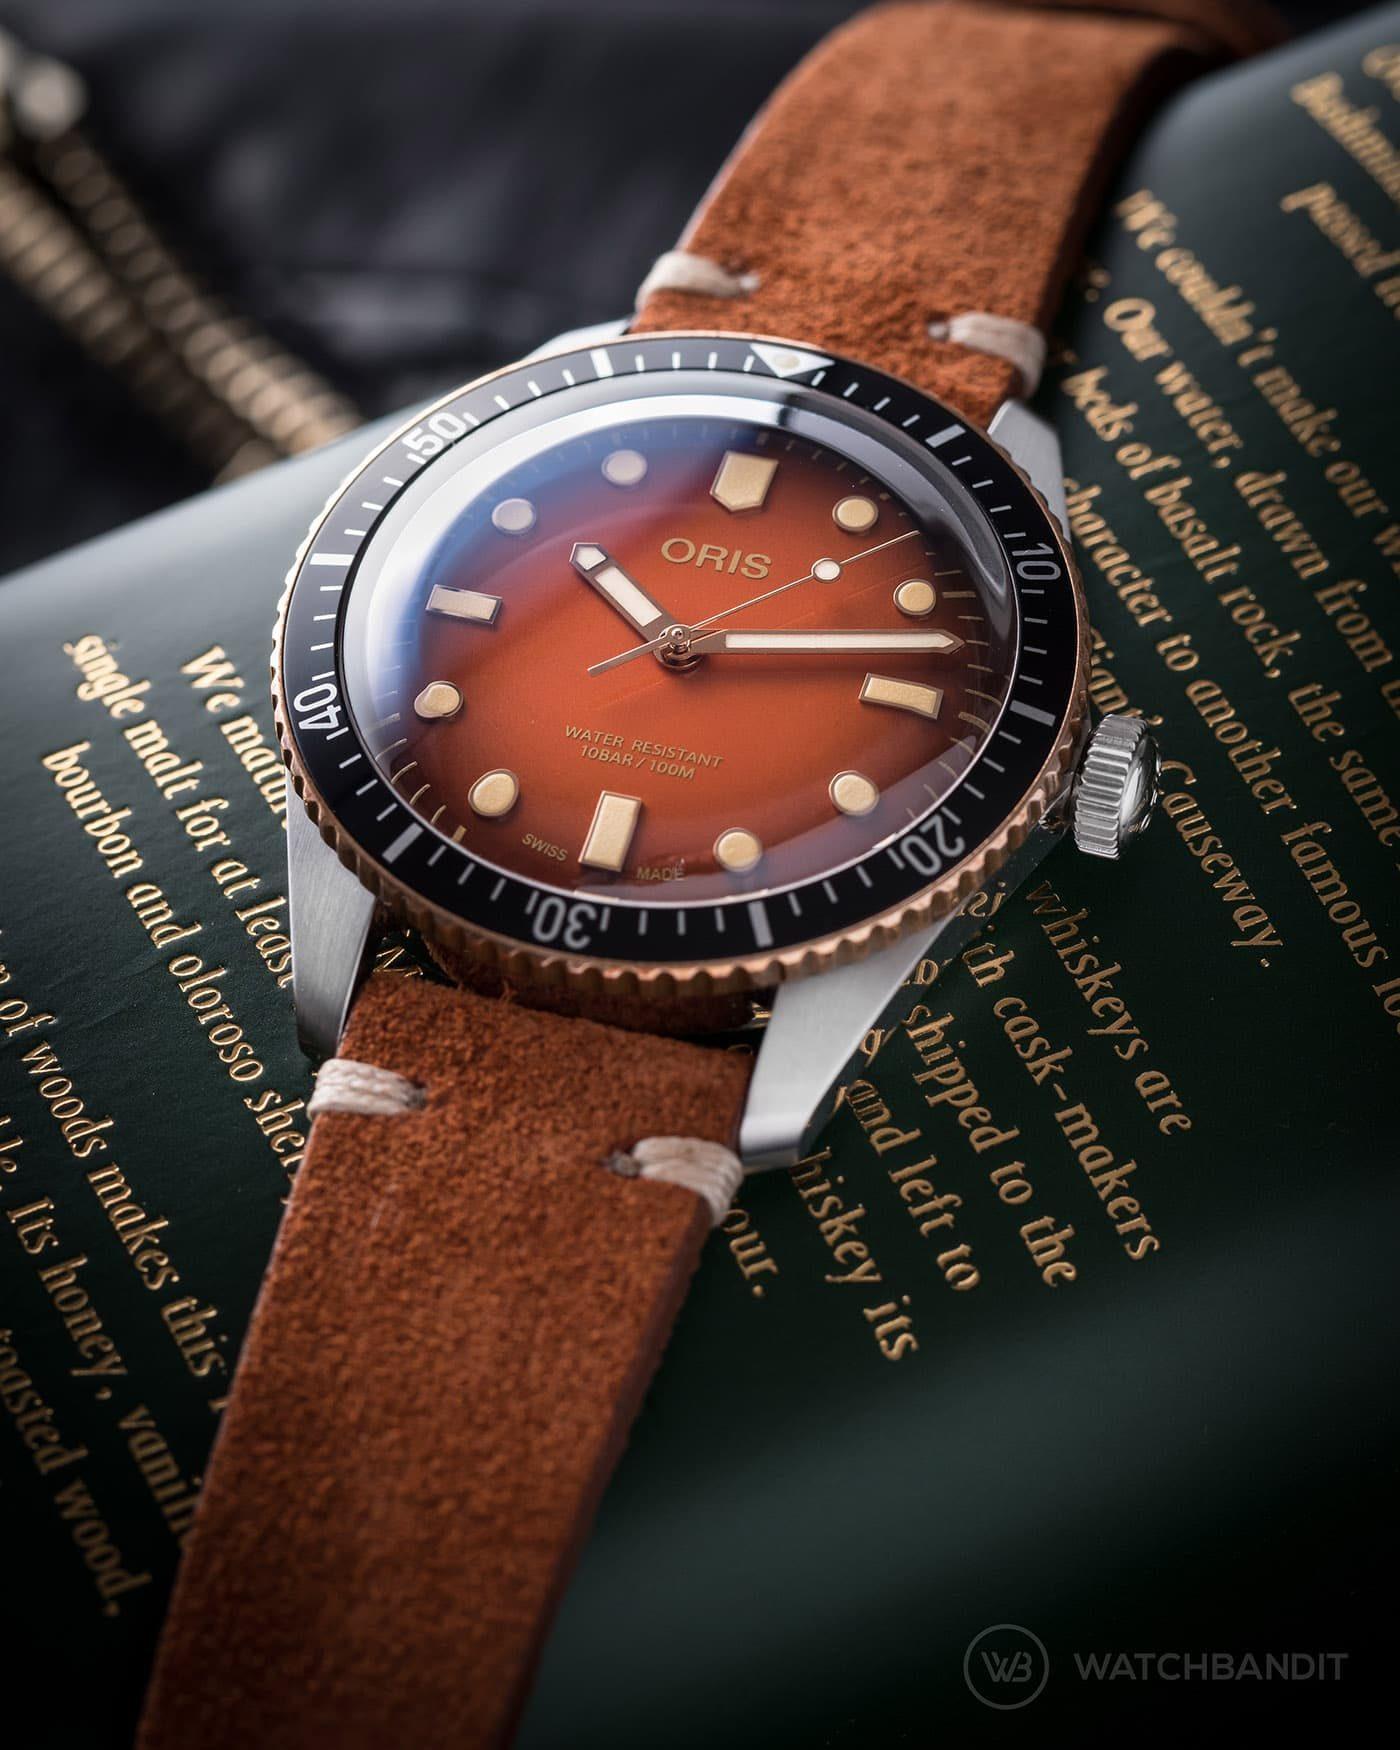 Oris Diver 65 rusty brown suede strap by watchbandit